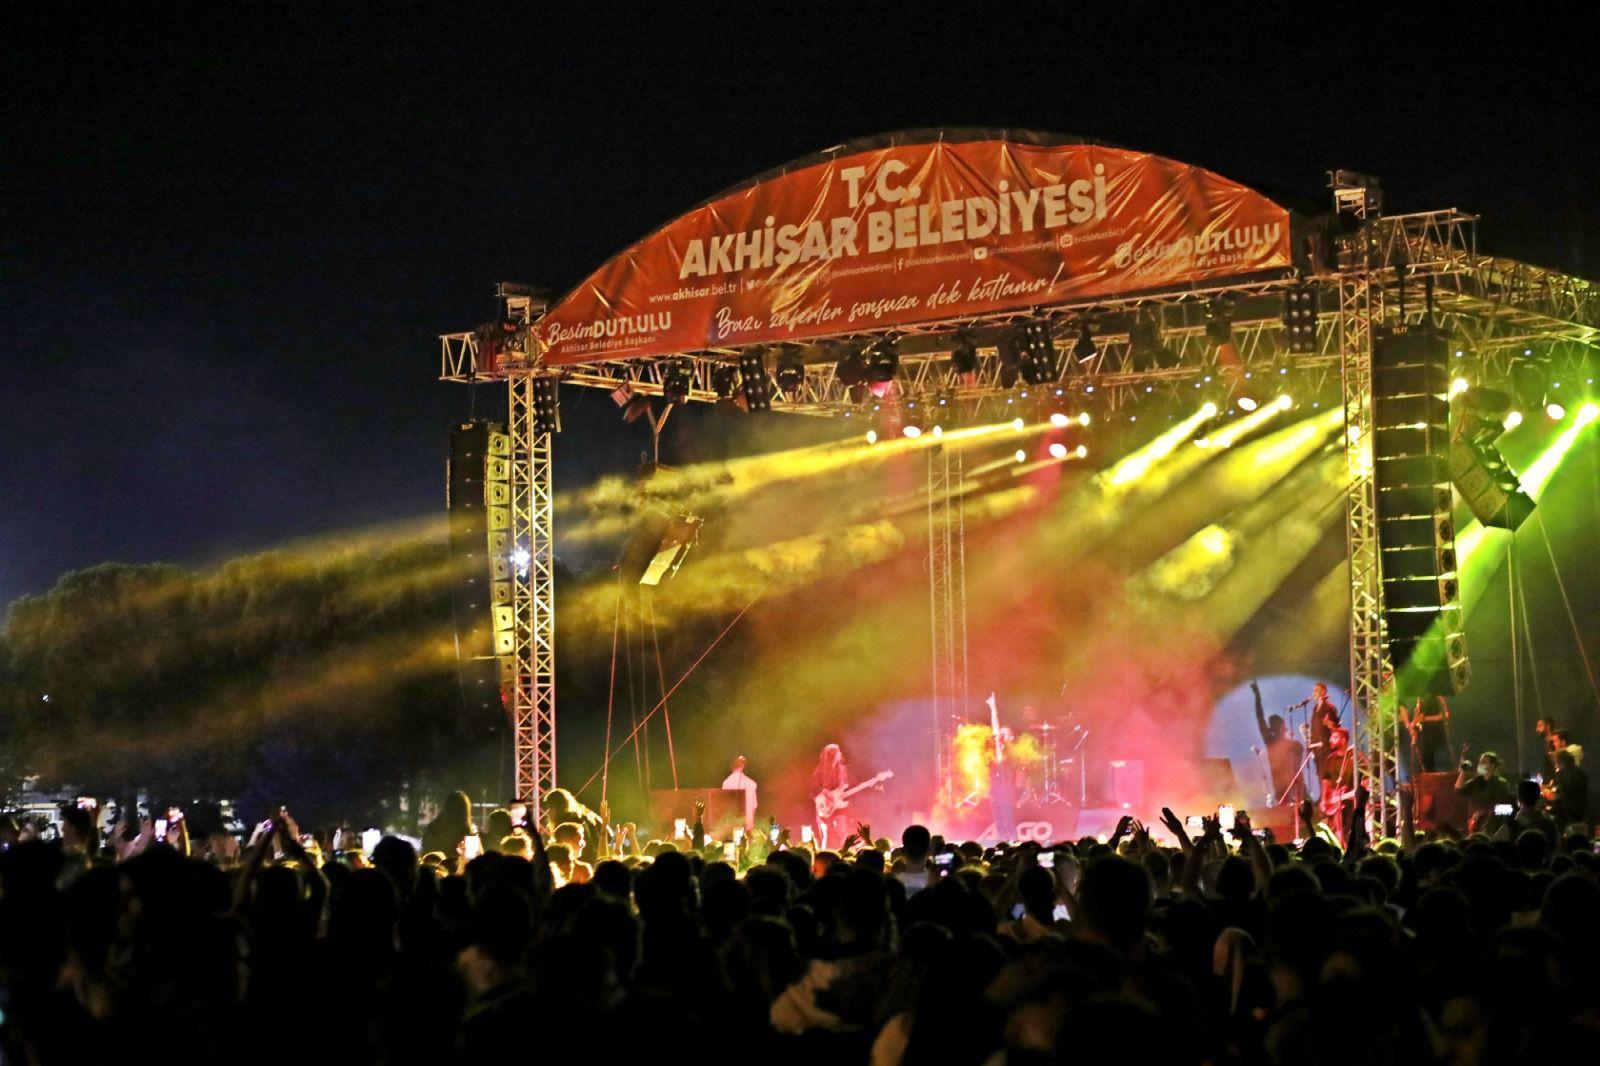 Gazapizm'den Akhisar'da unutulmaz konser (2)